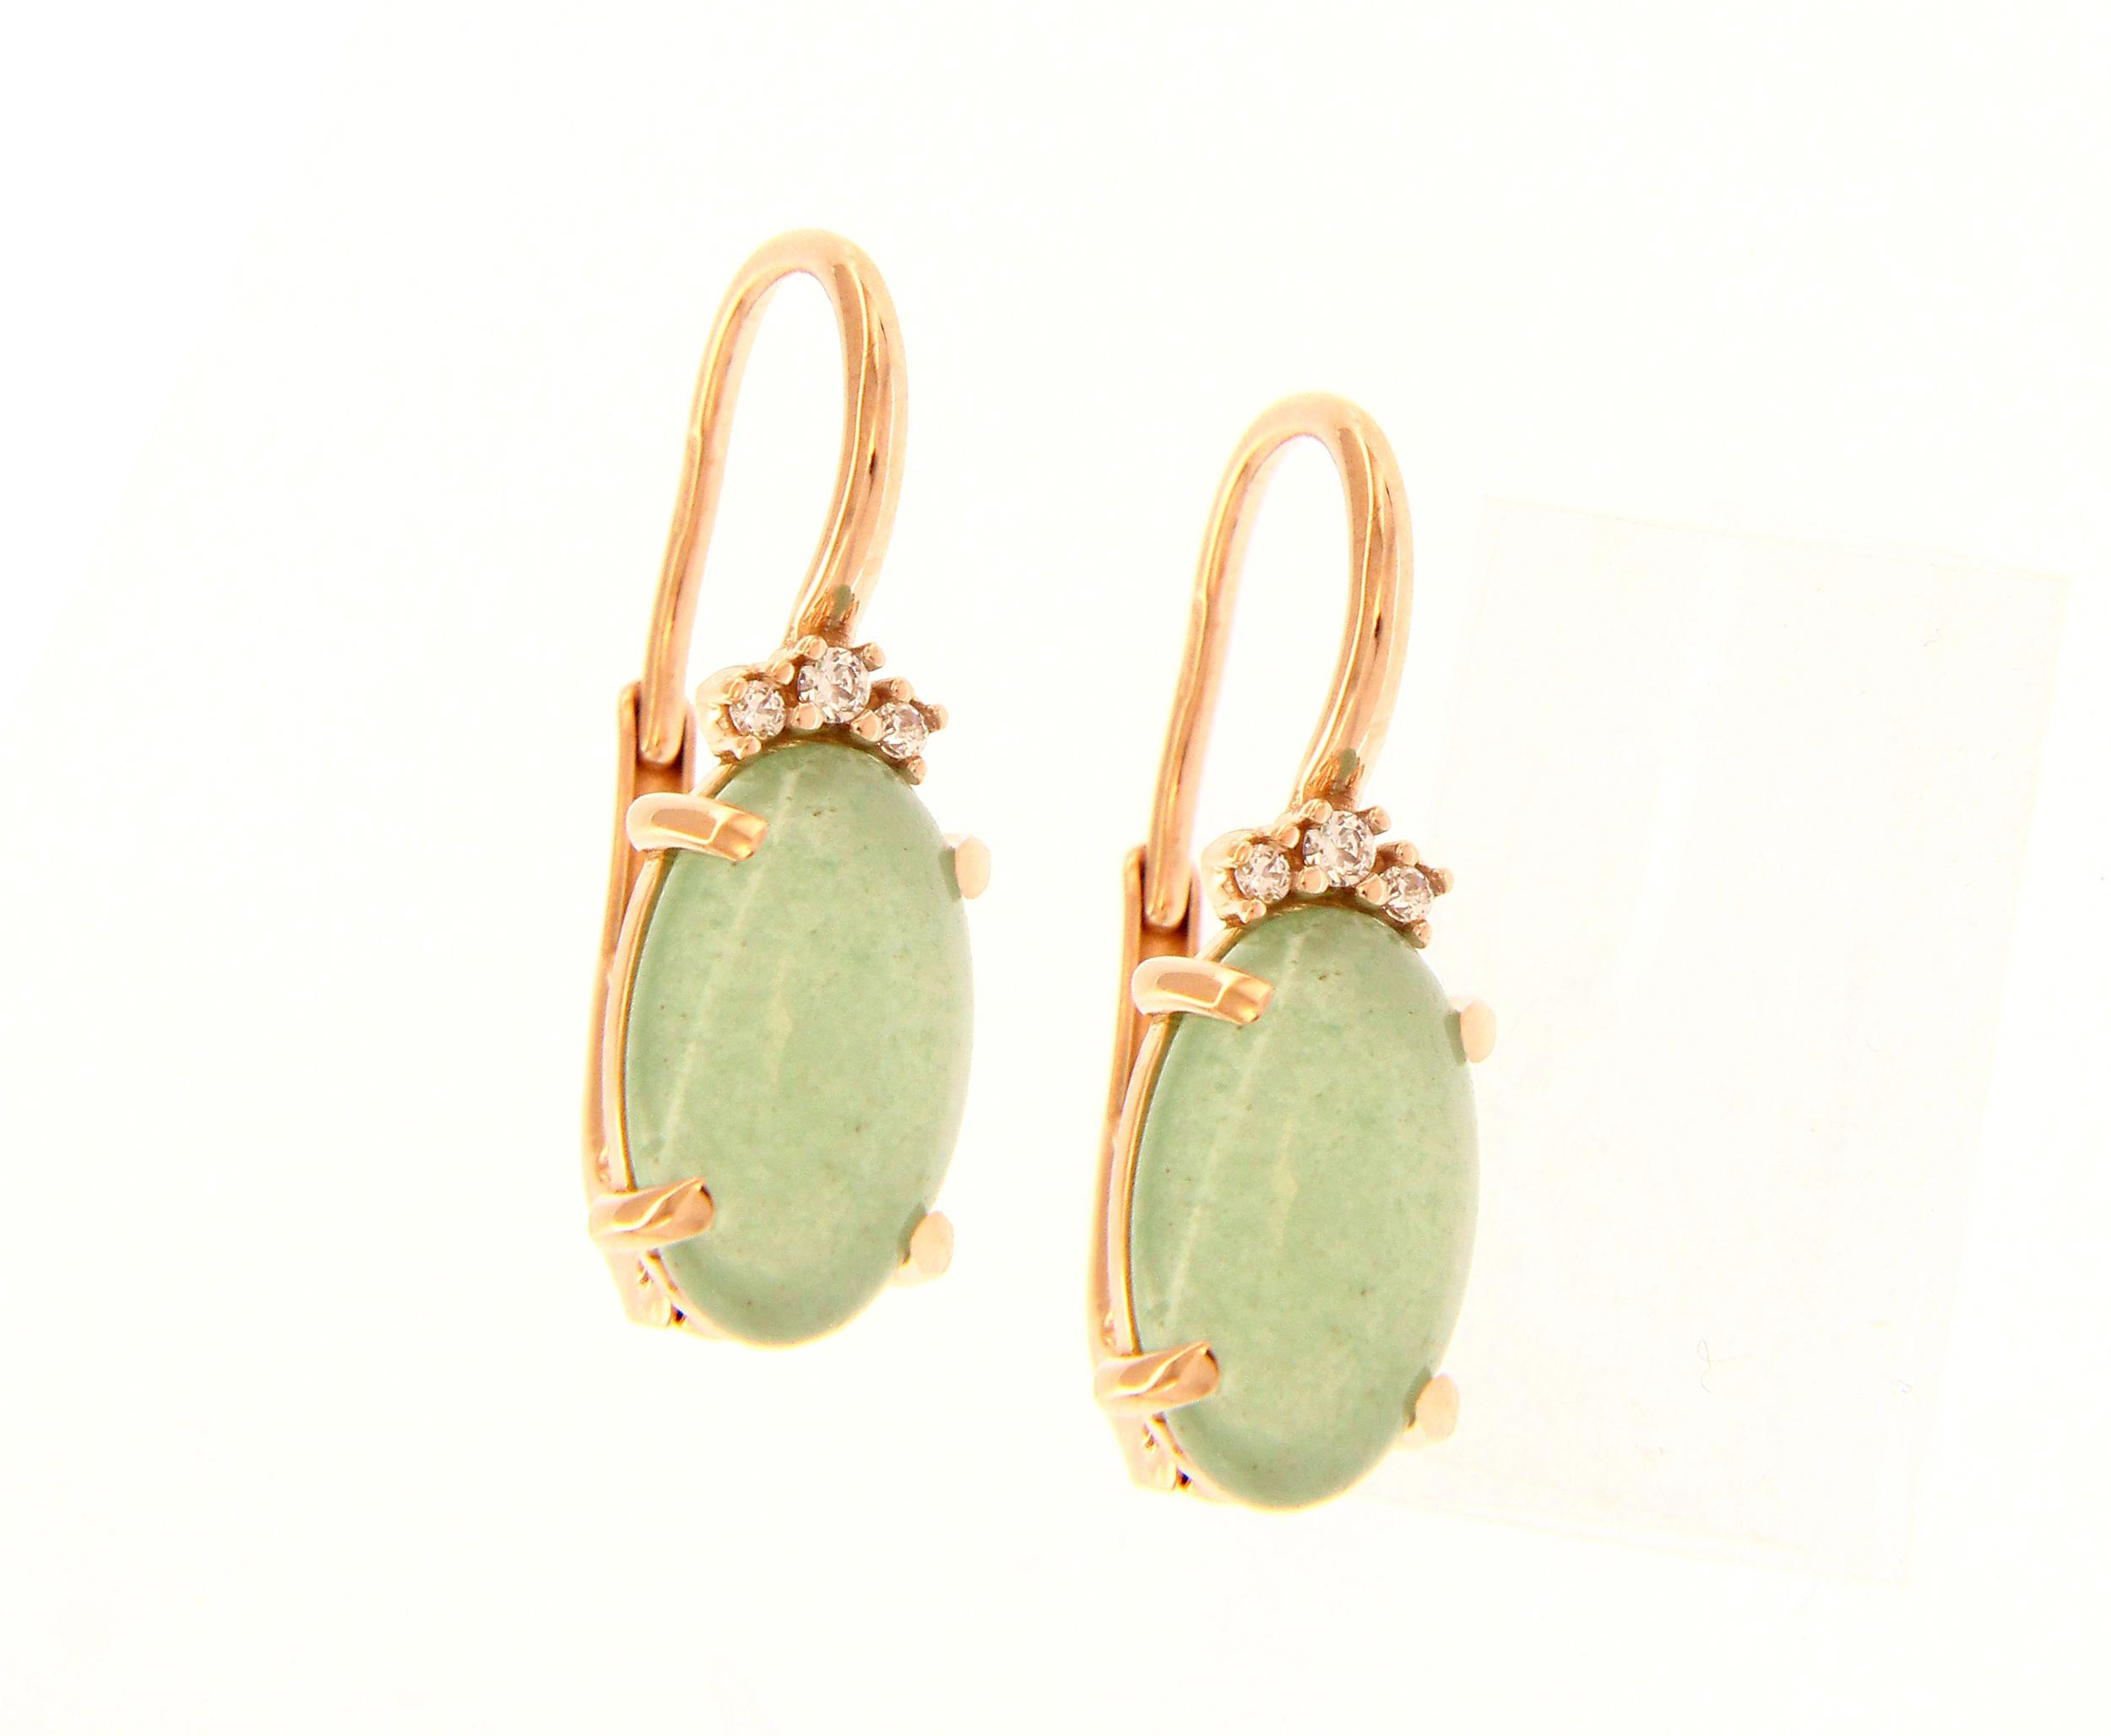 pendientes mujer oro agatas verdes - aretes mujer piedras verdes - gold earrings to buy online - joyeria marga mira